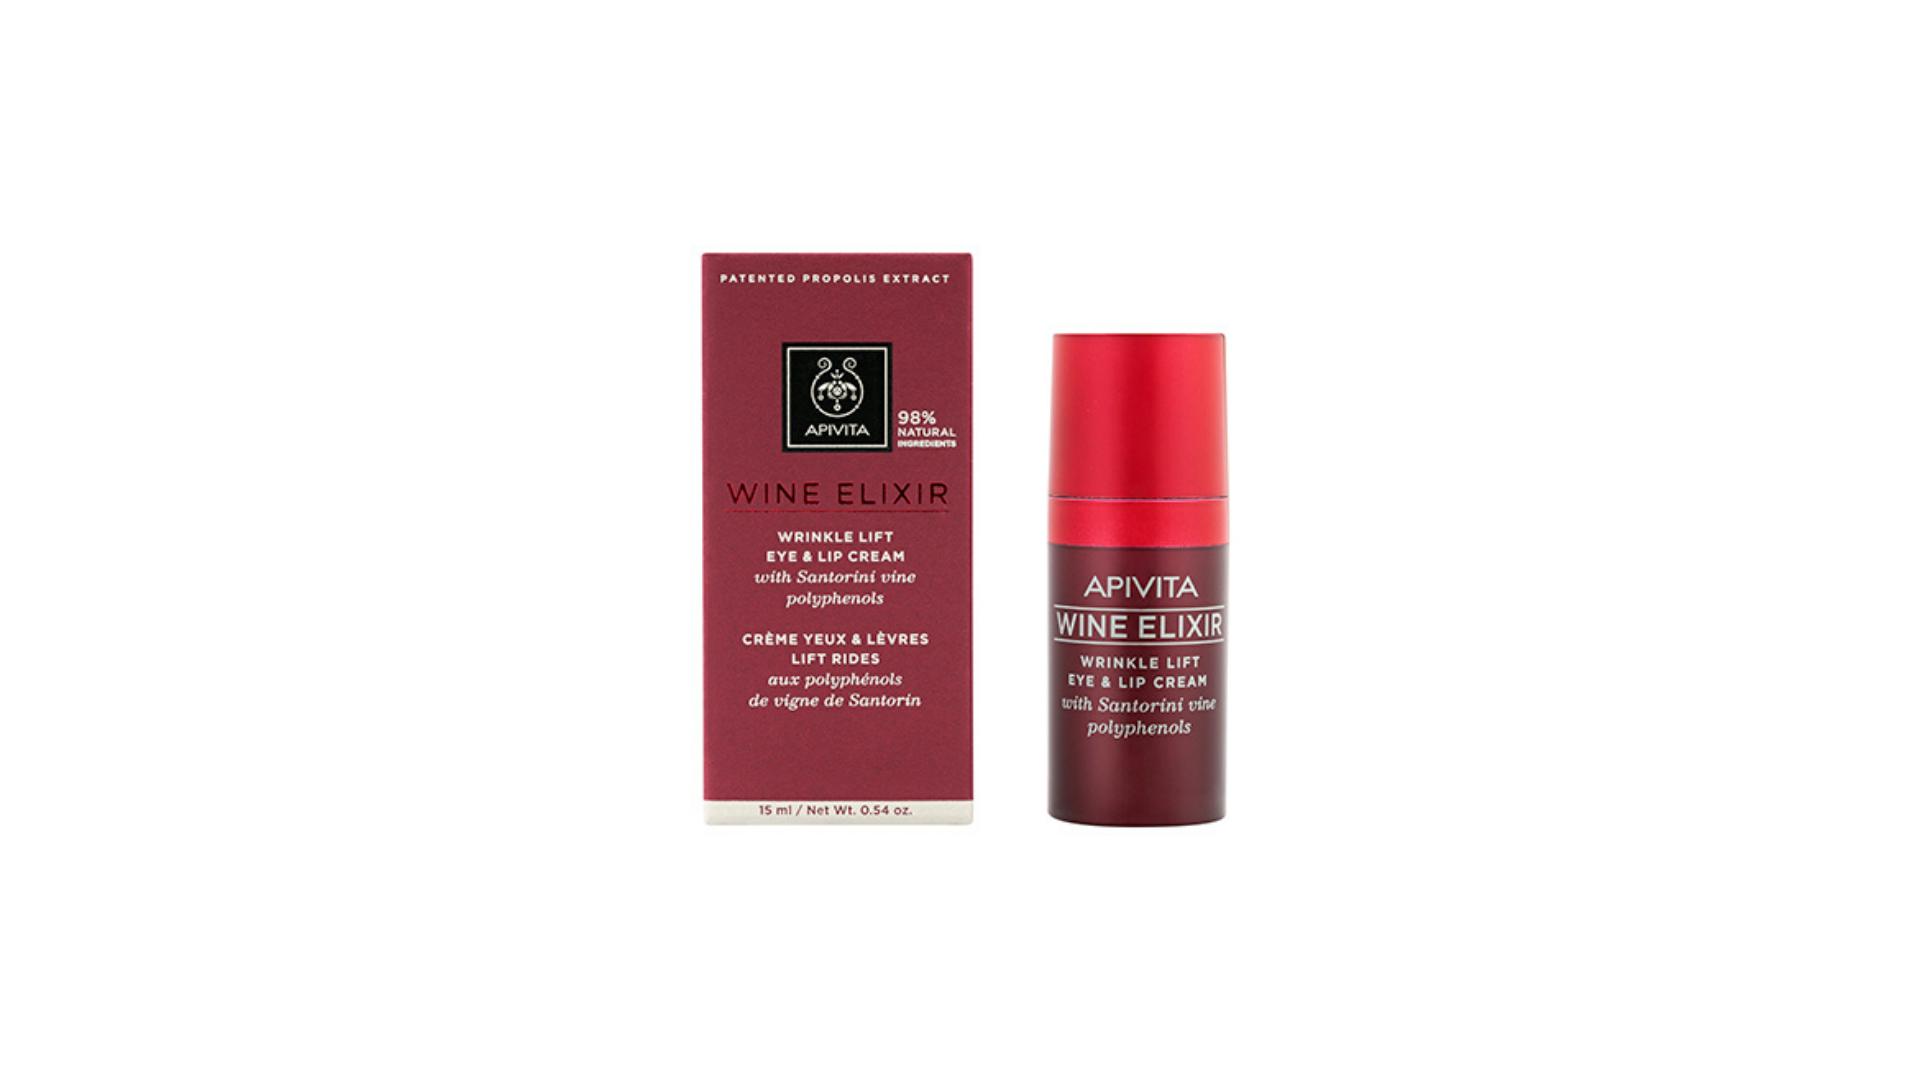 Apivita   Wine Elixir Creme de Olhos e Lábios Antirrugas e Lifting 15ml